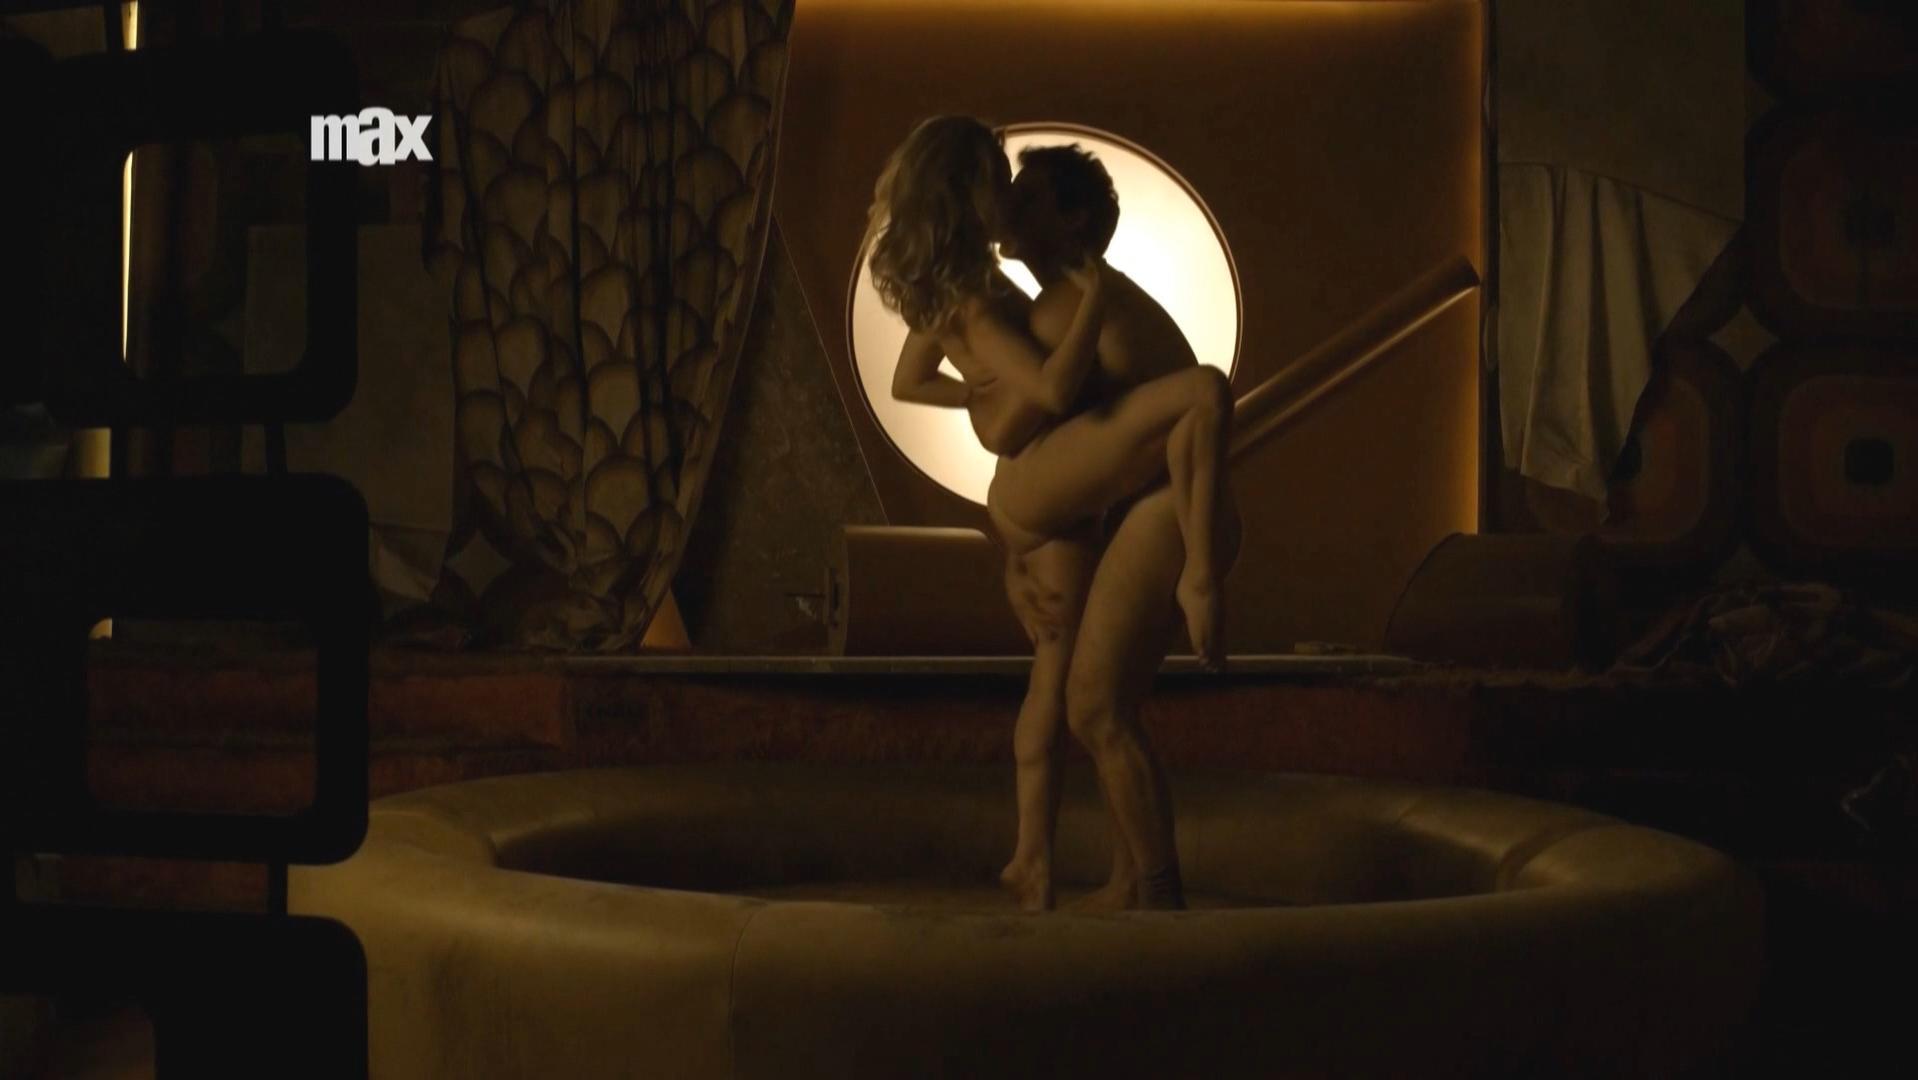 Fabiana Gugli nude - Motel s01e01 (2014)